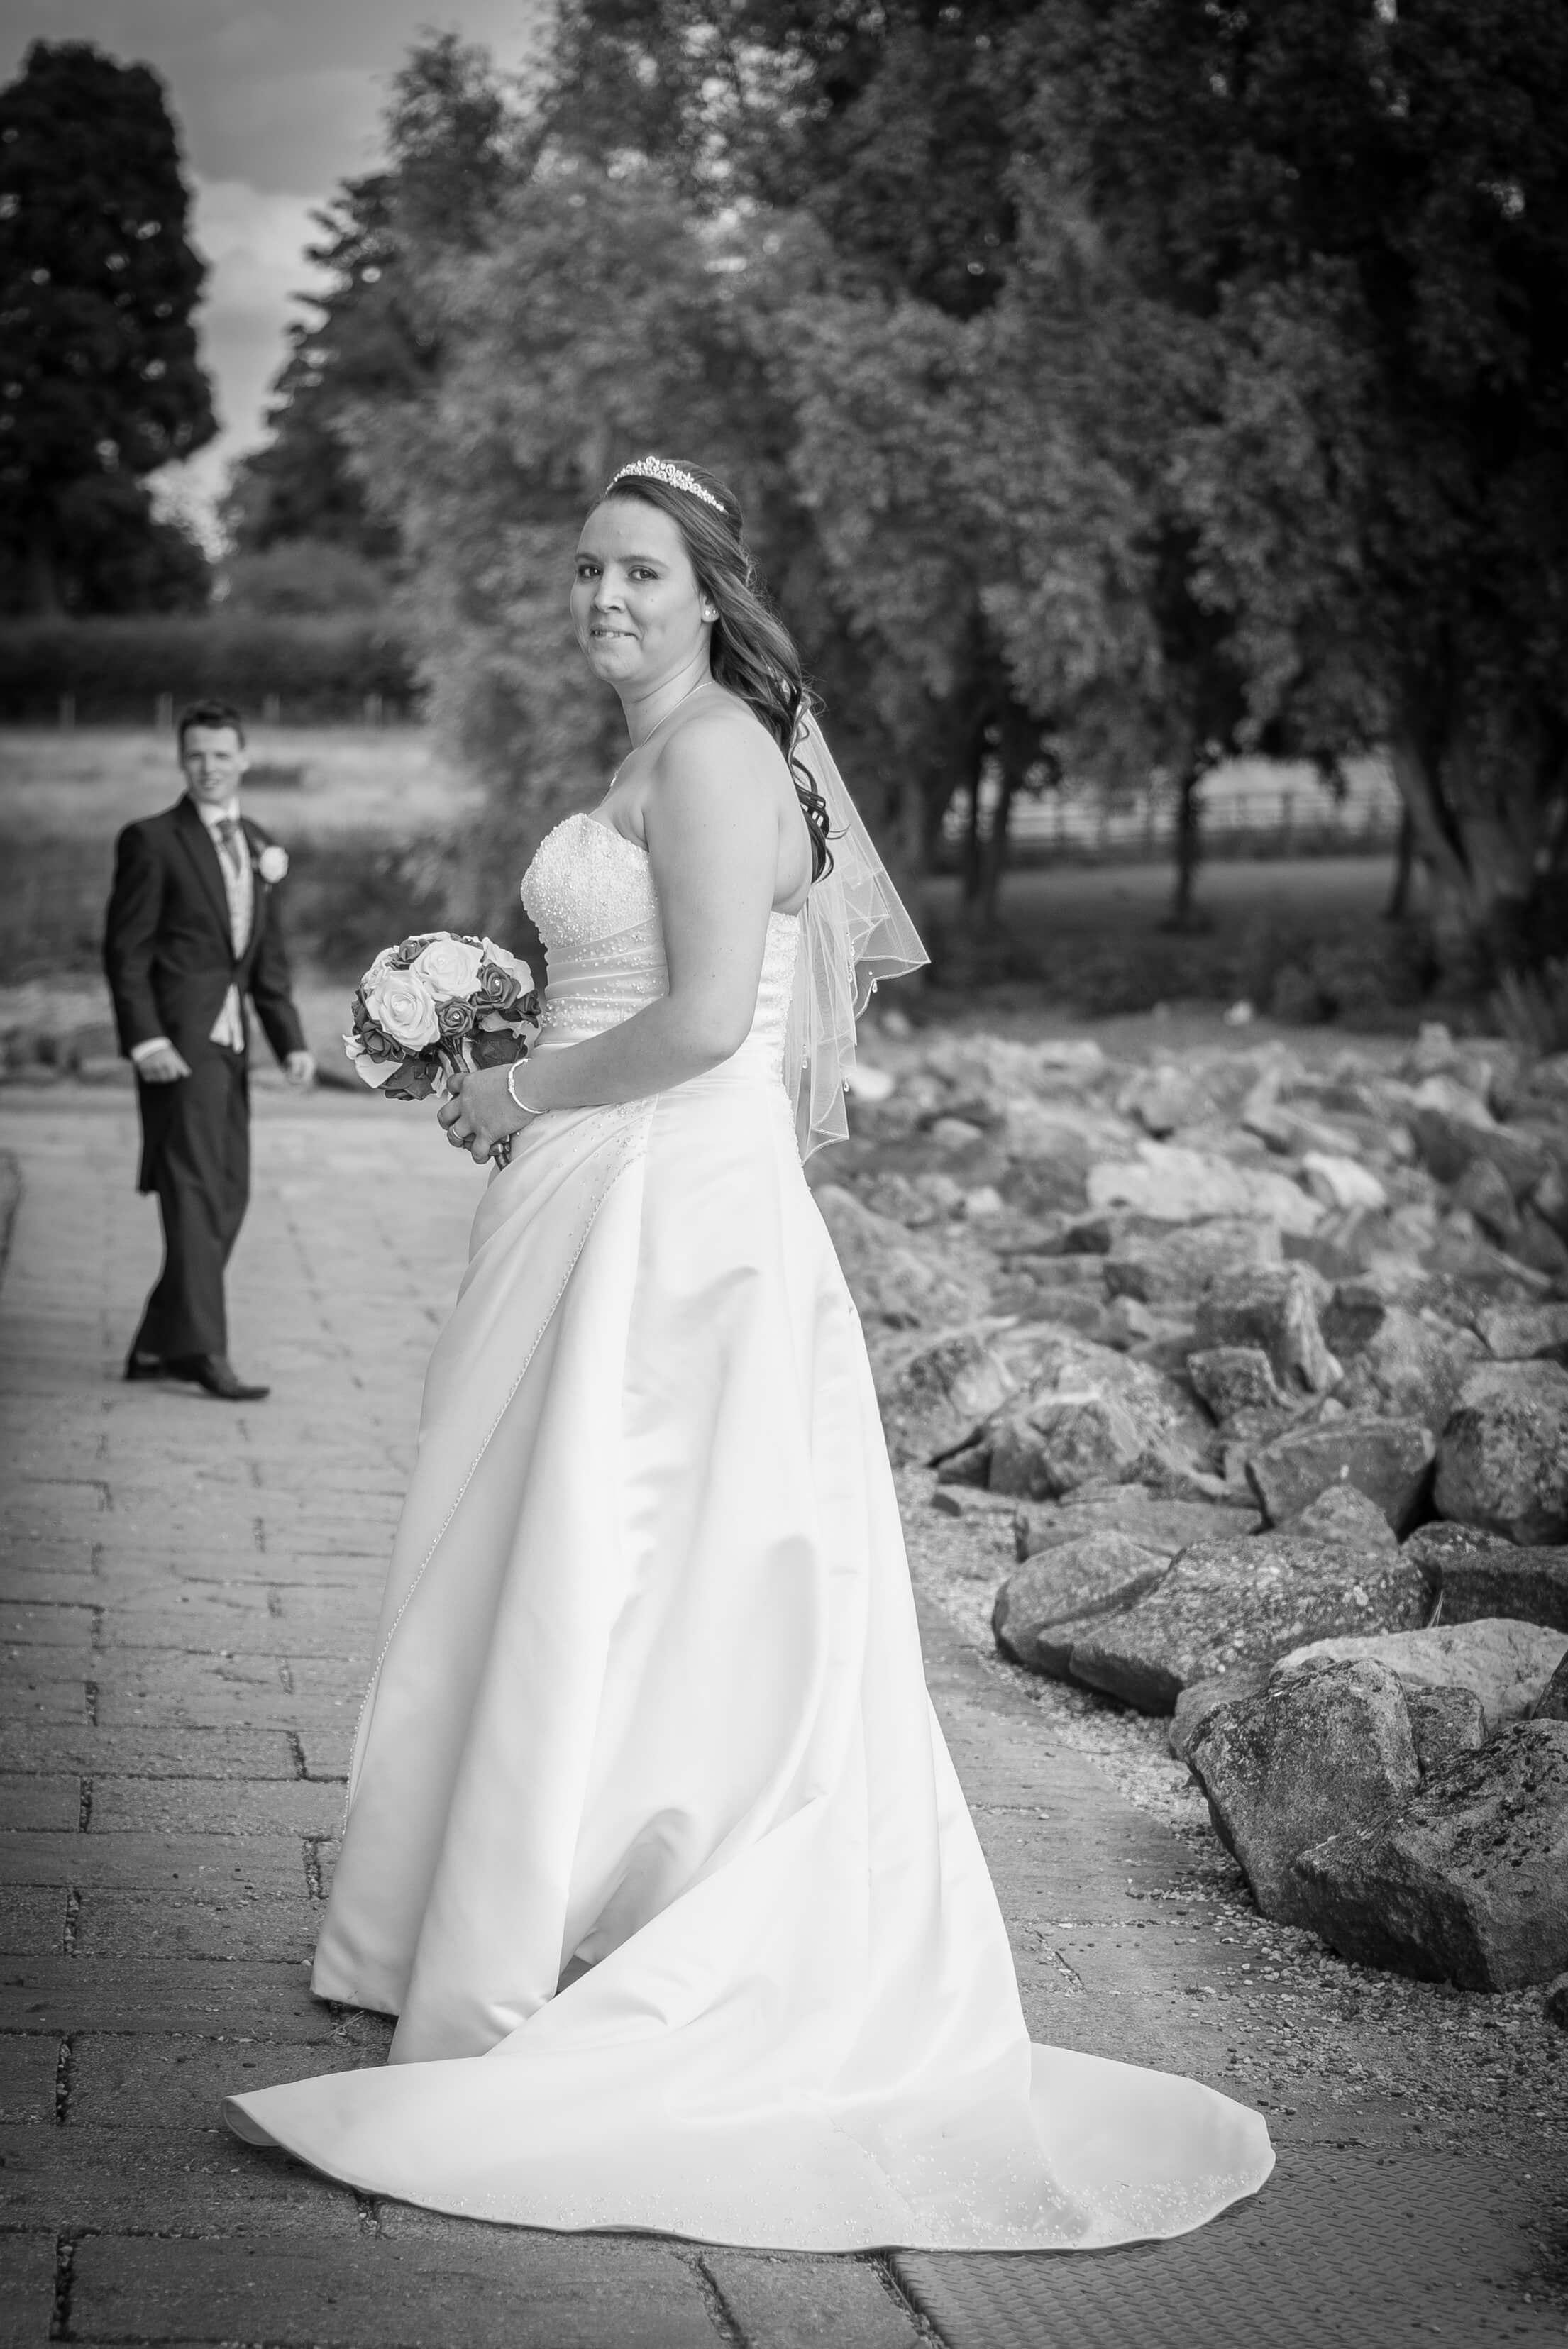 Wedding Photography Gallery 2